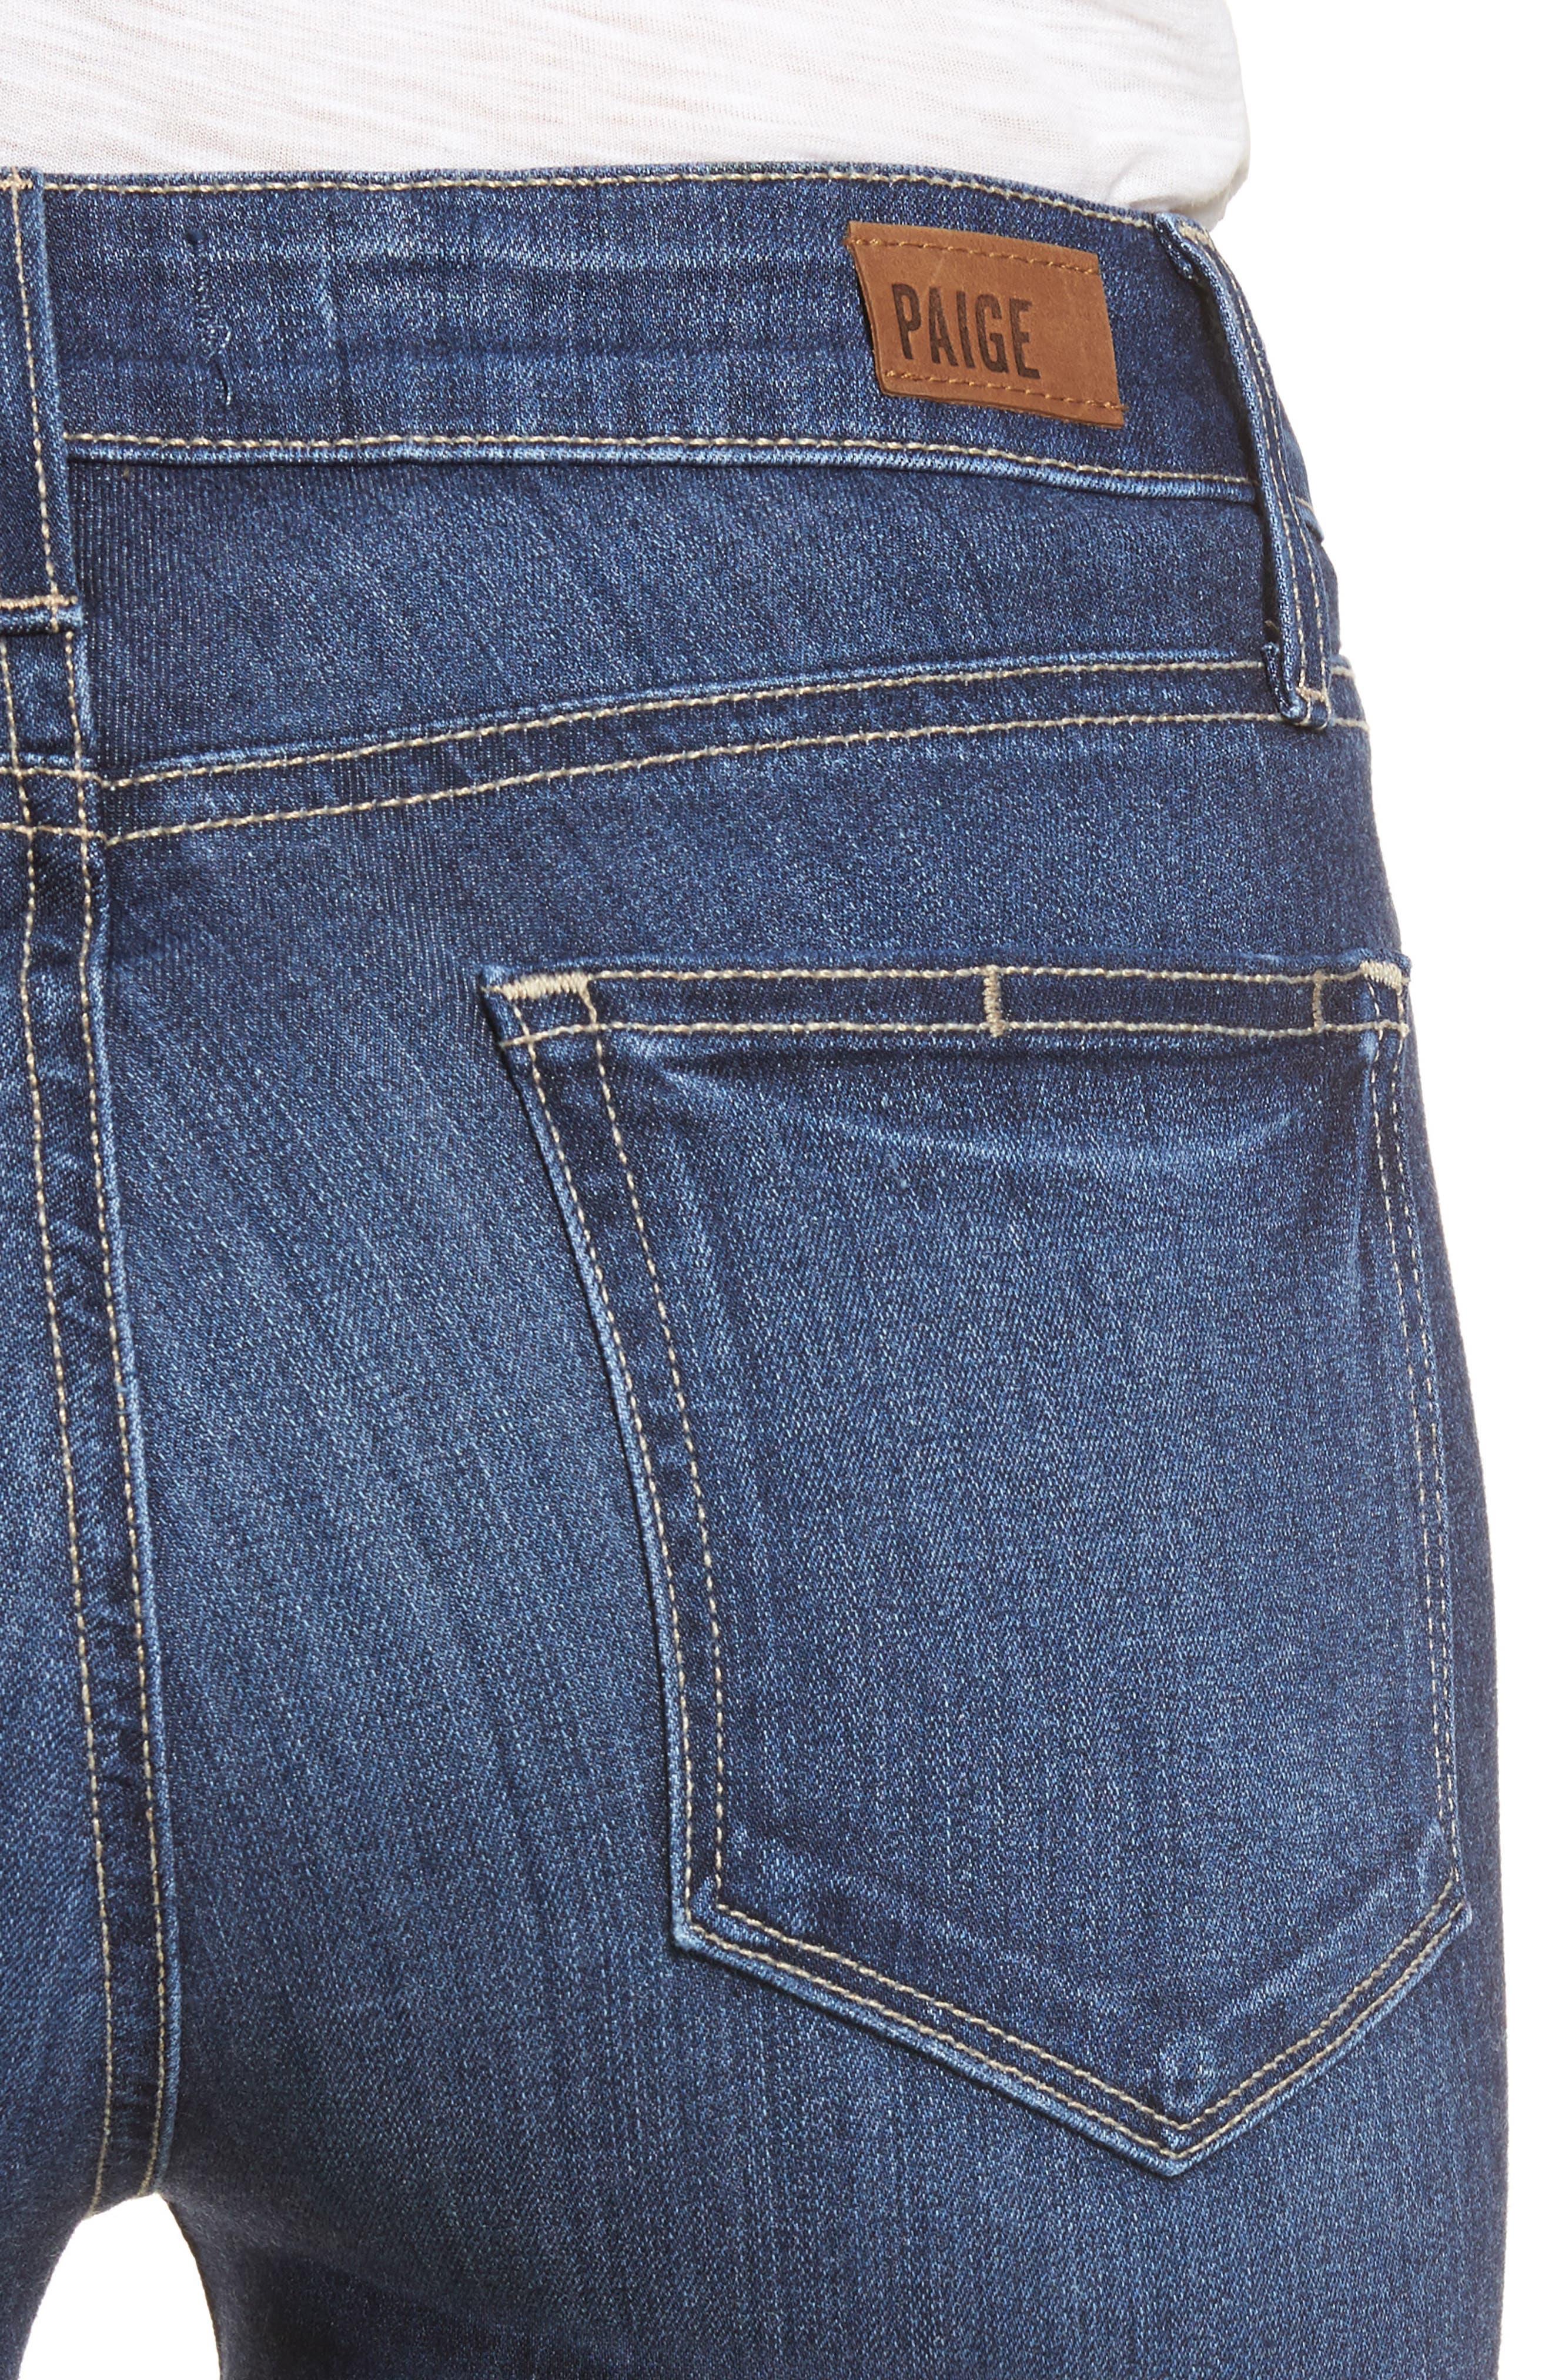 Transcend - Verdugo Ankle Skinny Jeans,                             Alternate thumbnail 4, color,                             Blue